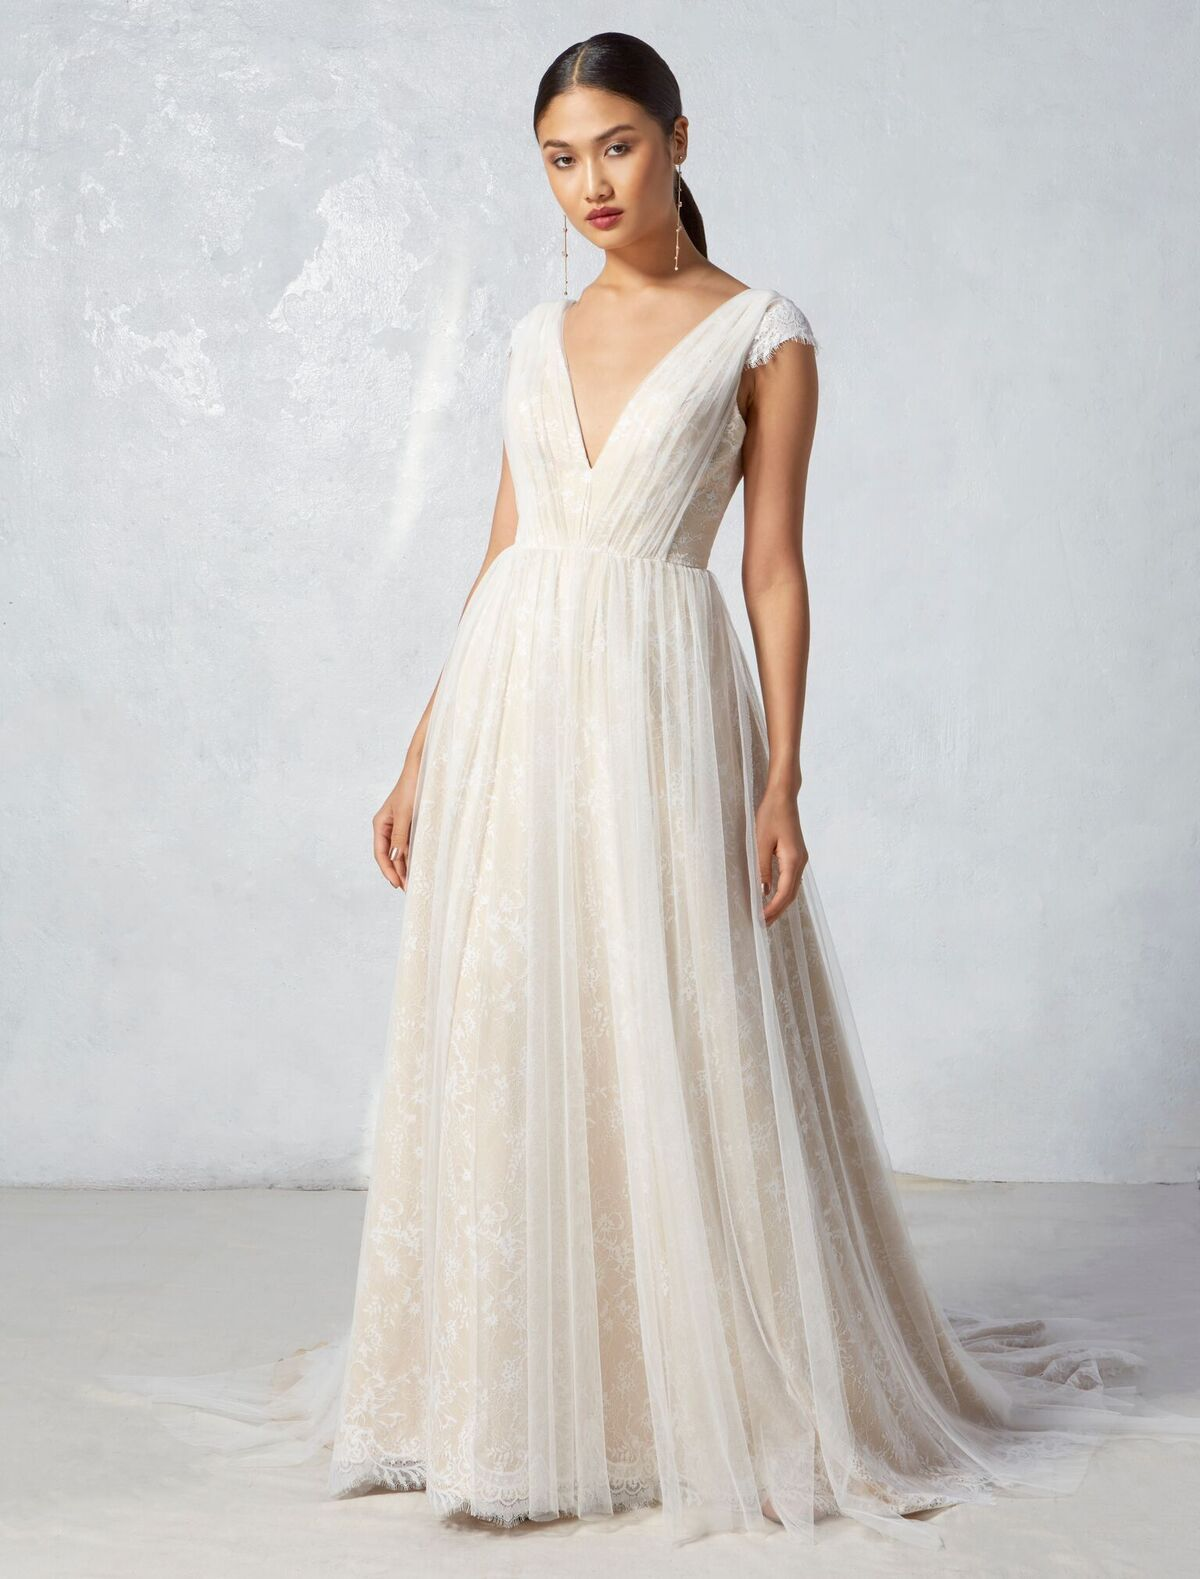 Superb Audra Ivy u Aster Fall Collection V neck lace wedding dress